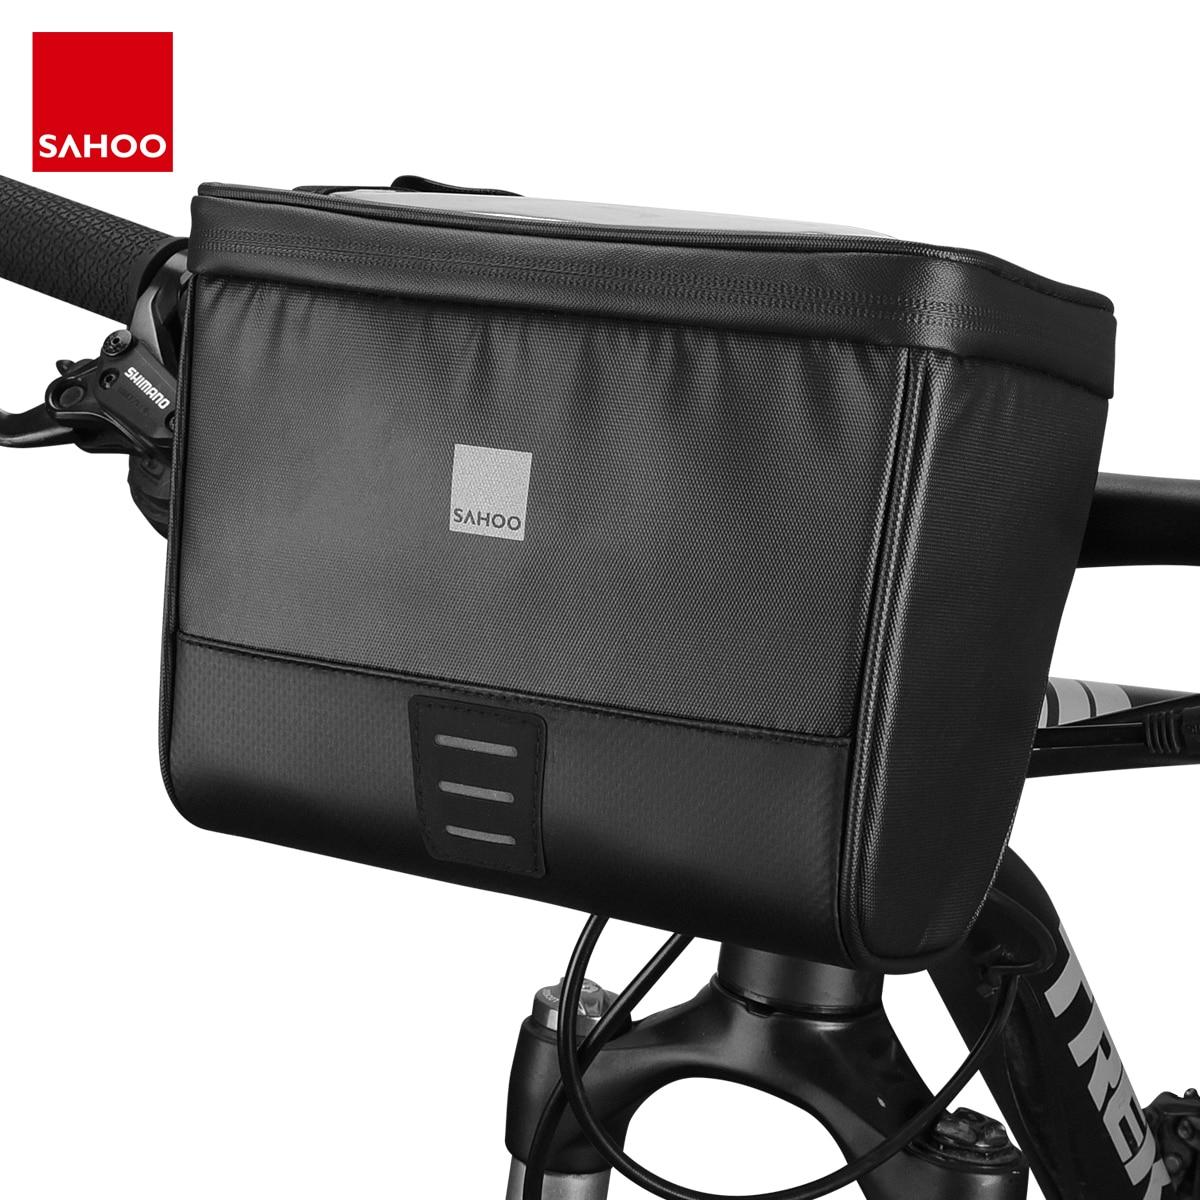 Sahoo Travel Series 112049 Waterproof Touchscreen Cycling Bike Bicycle Map Sleeve Handlebar Bag Pack Pannier Basket Phone Camera